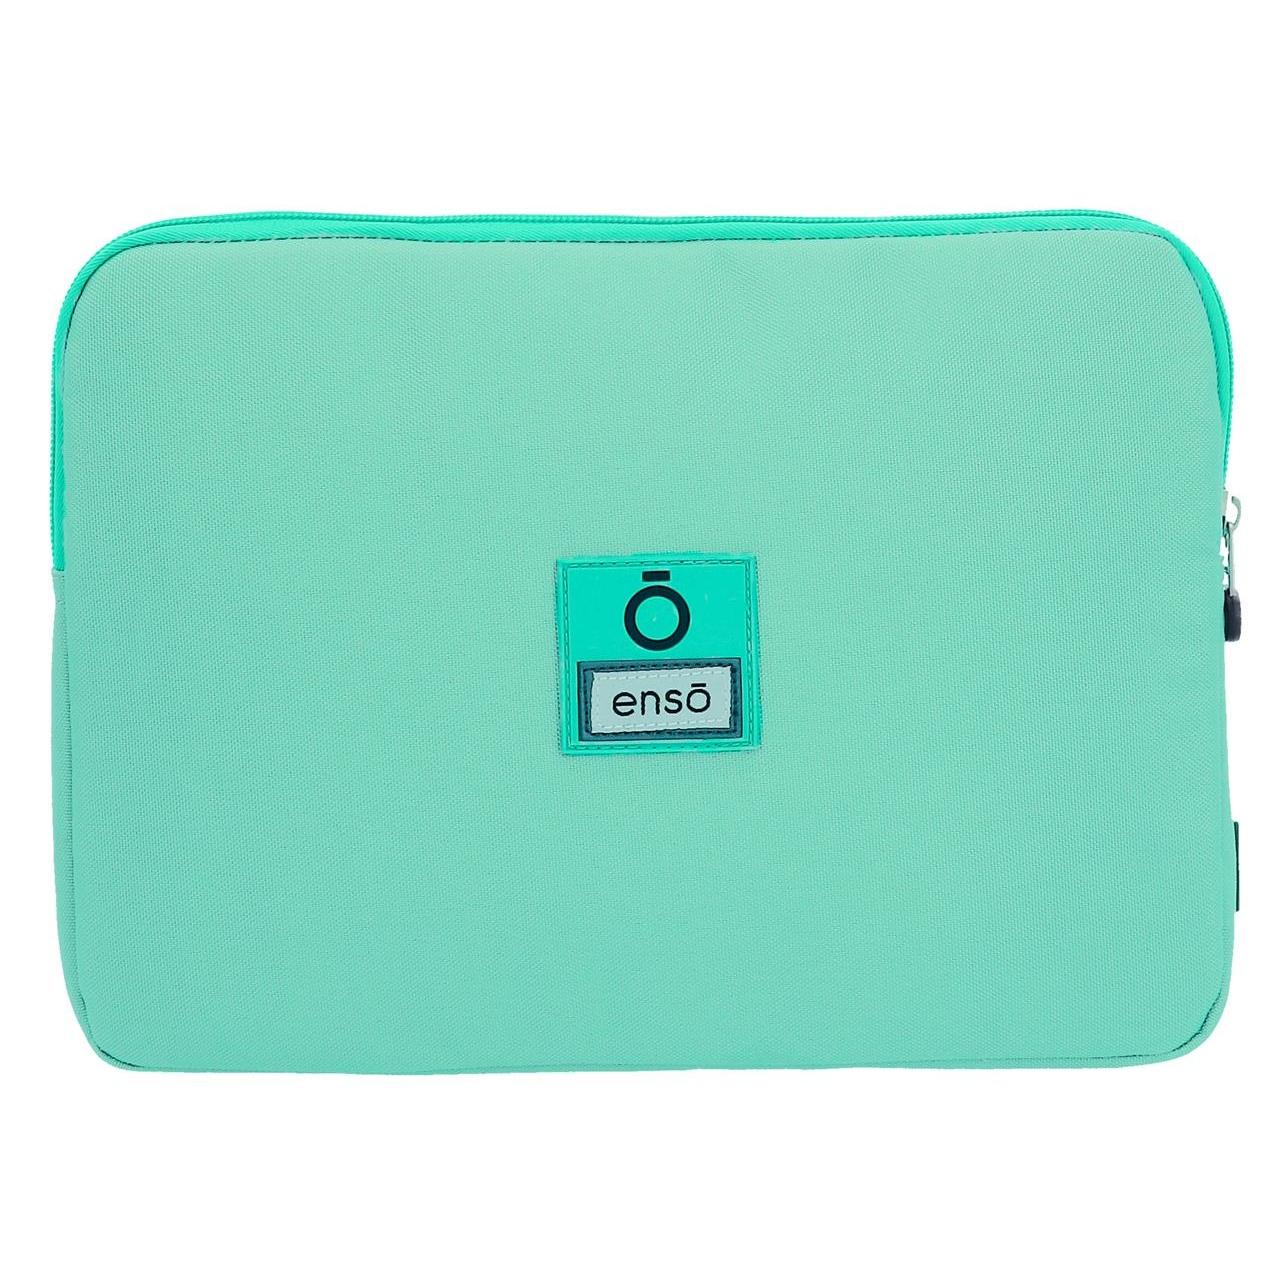 Funda para Tablet Enso Basic Turquesa